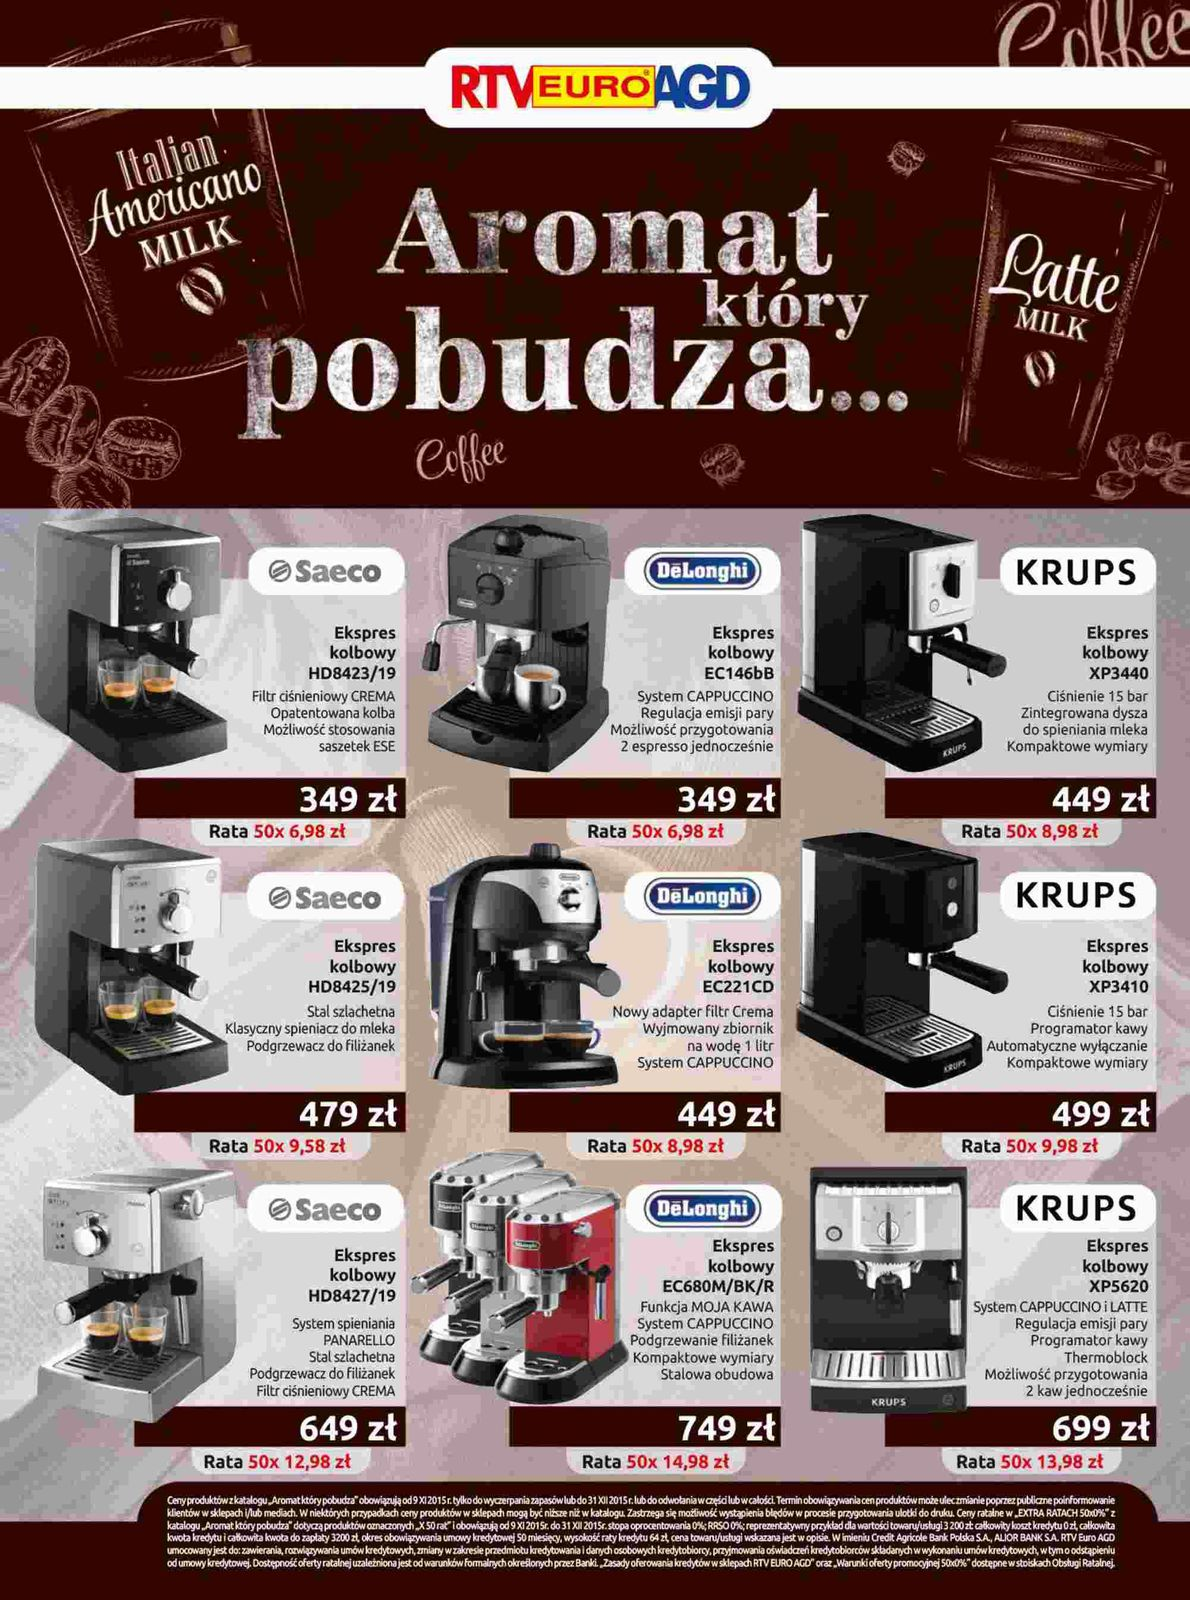 Gazetka promocyjna RTV Euro AGD do 31/12/2015 str.5